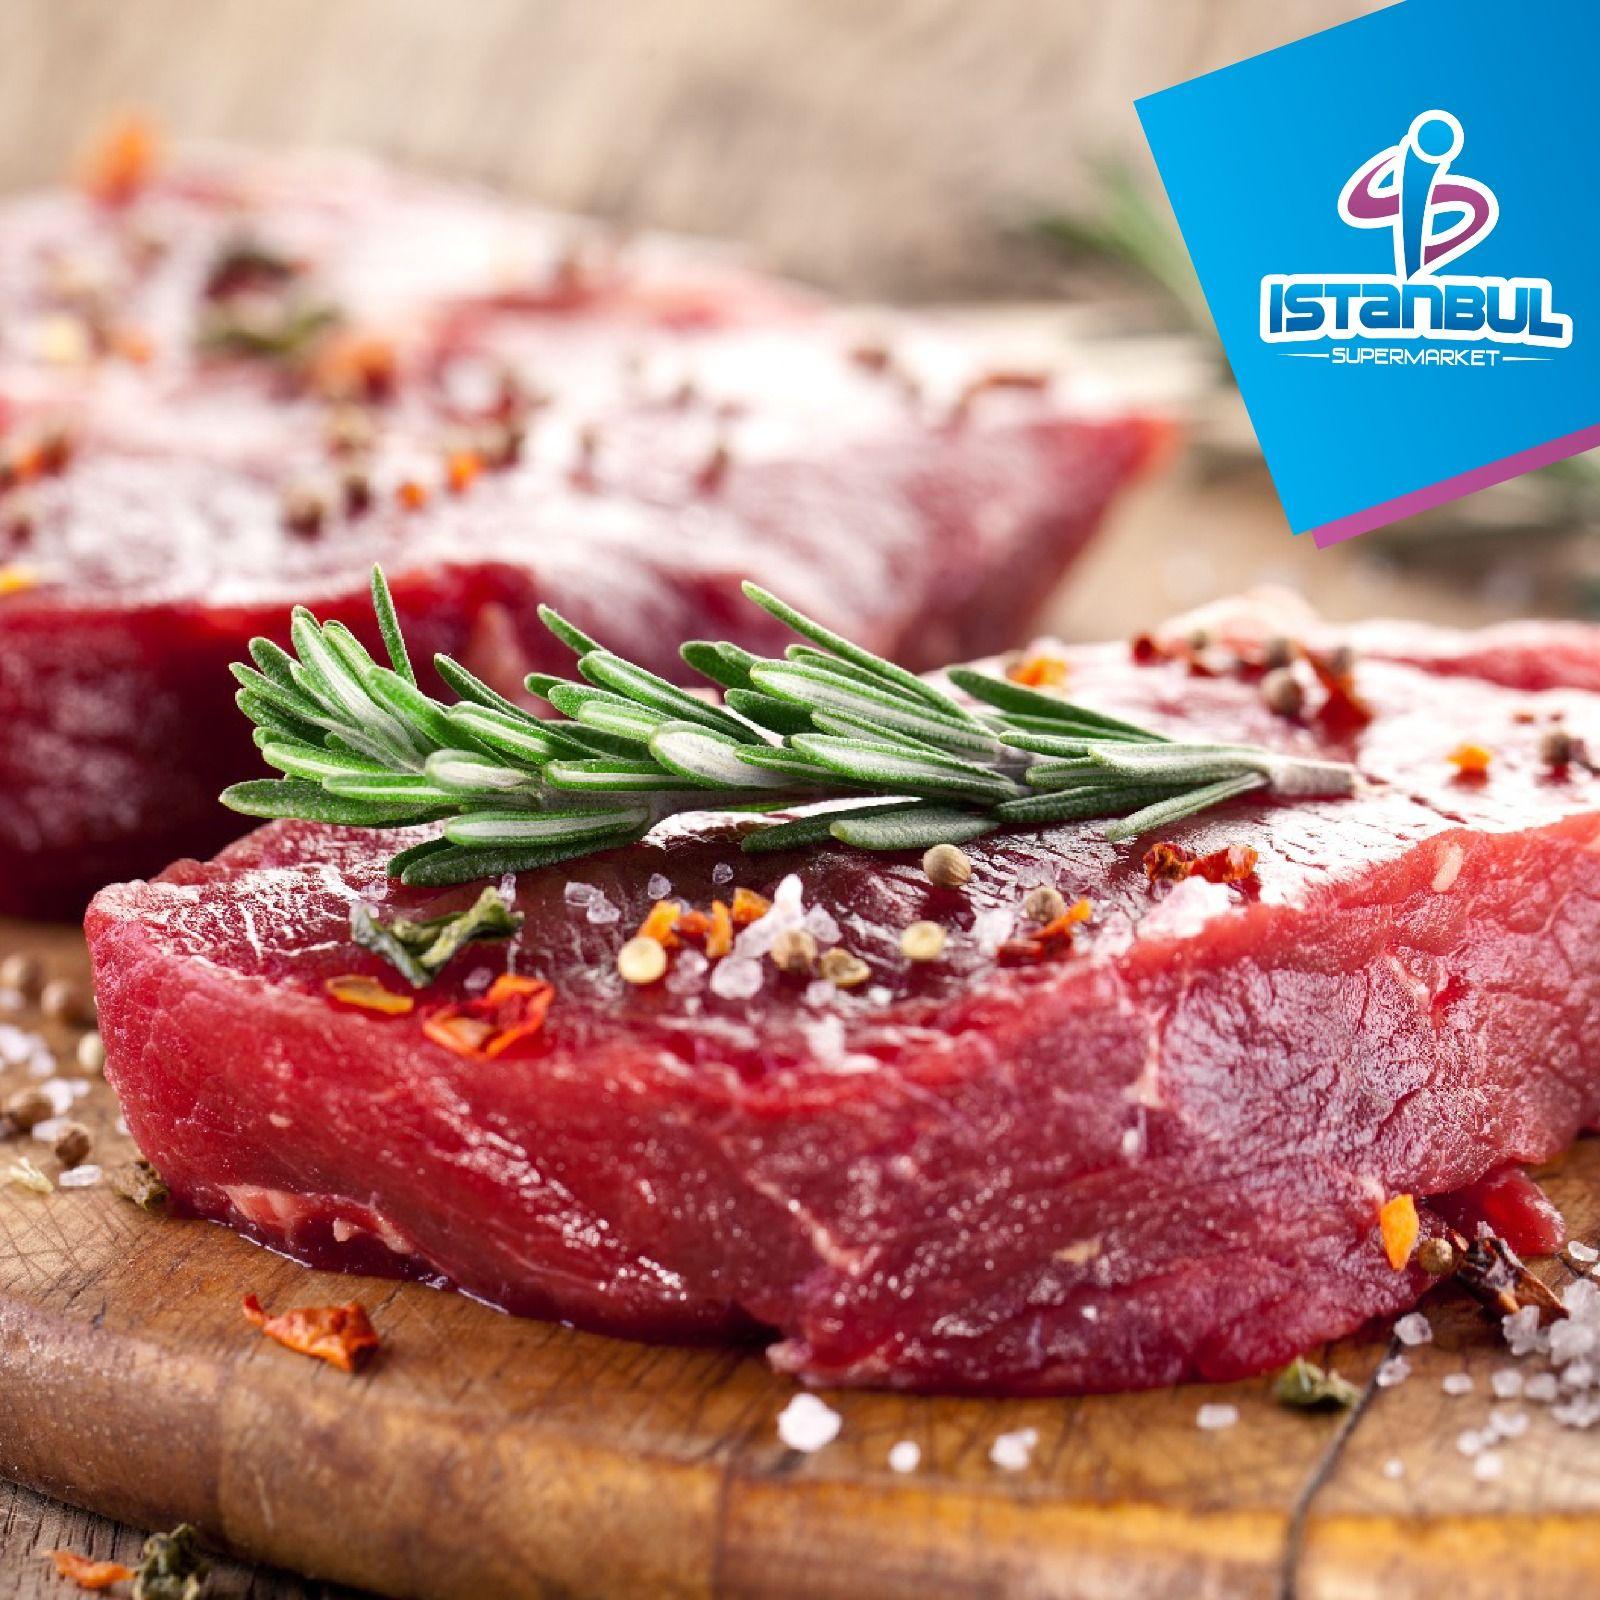 افضل انواع اللحوم الطازجة تجدونها لدى سوبر ماركت إسطنبول في جميع فروعها Prepare A Flavorful Meal To Enjoy With The Family This Friday With T Beef Food Steak